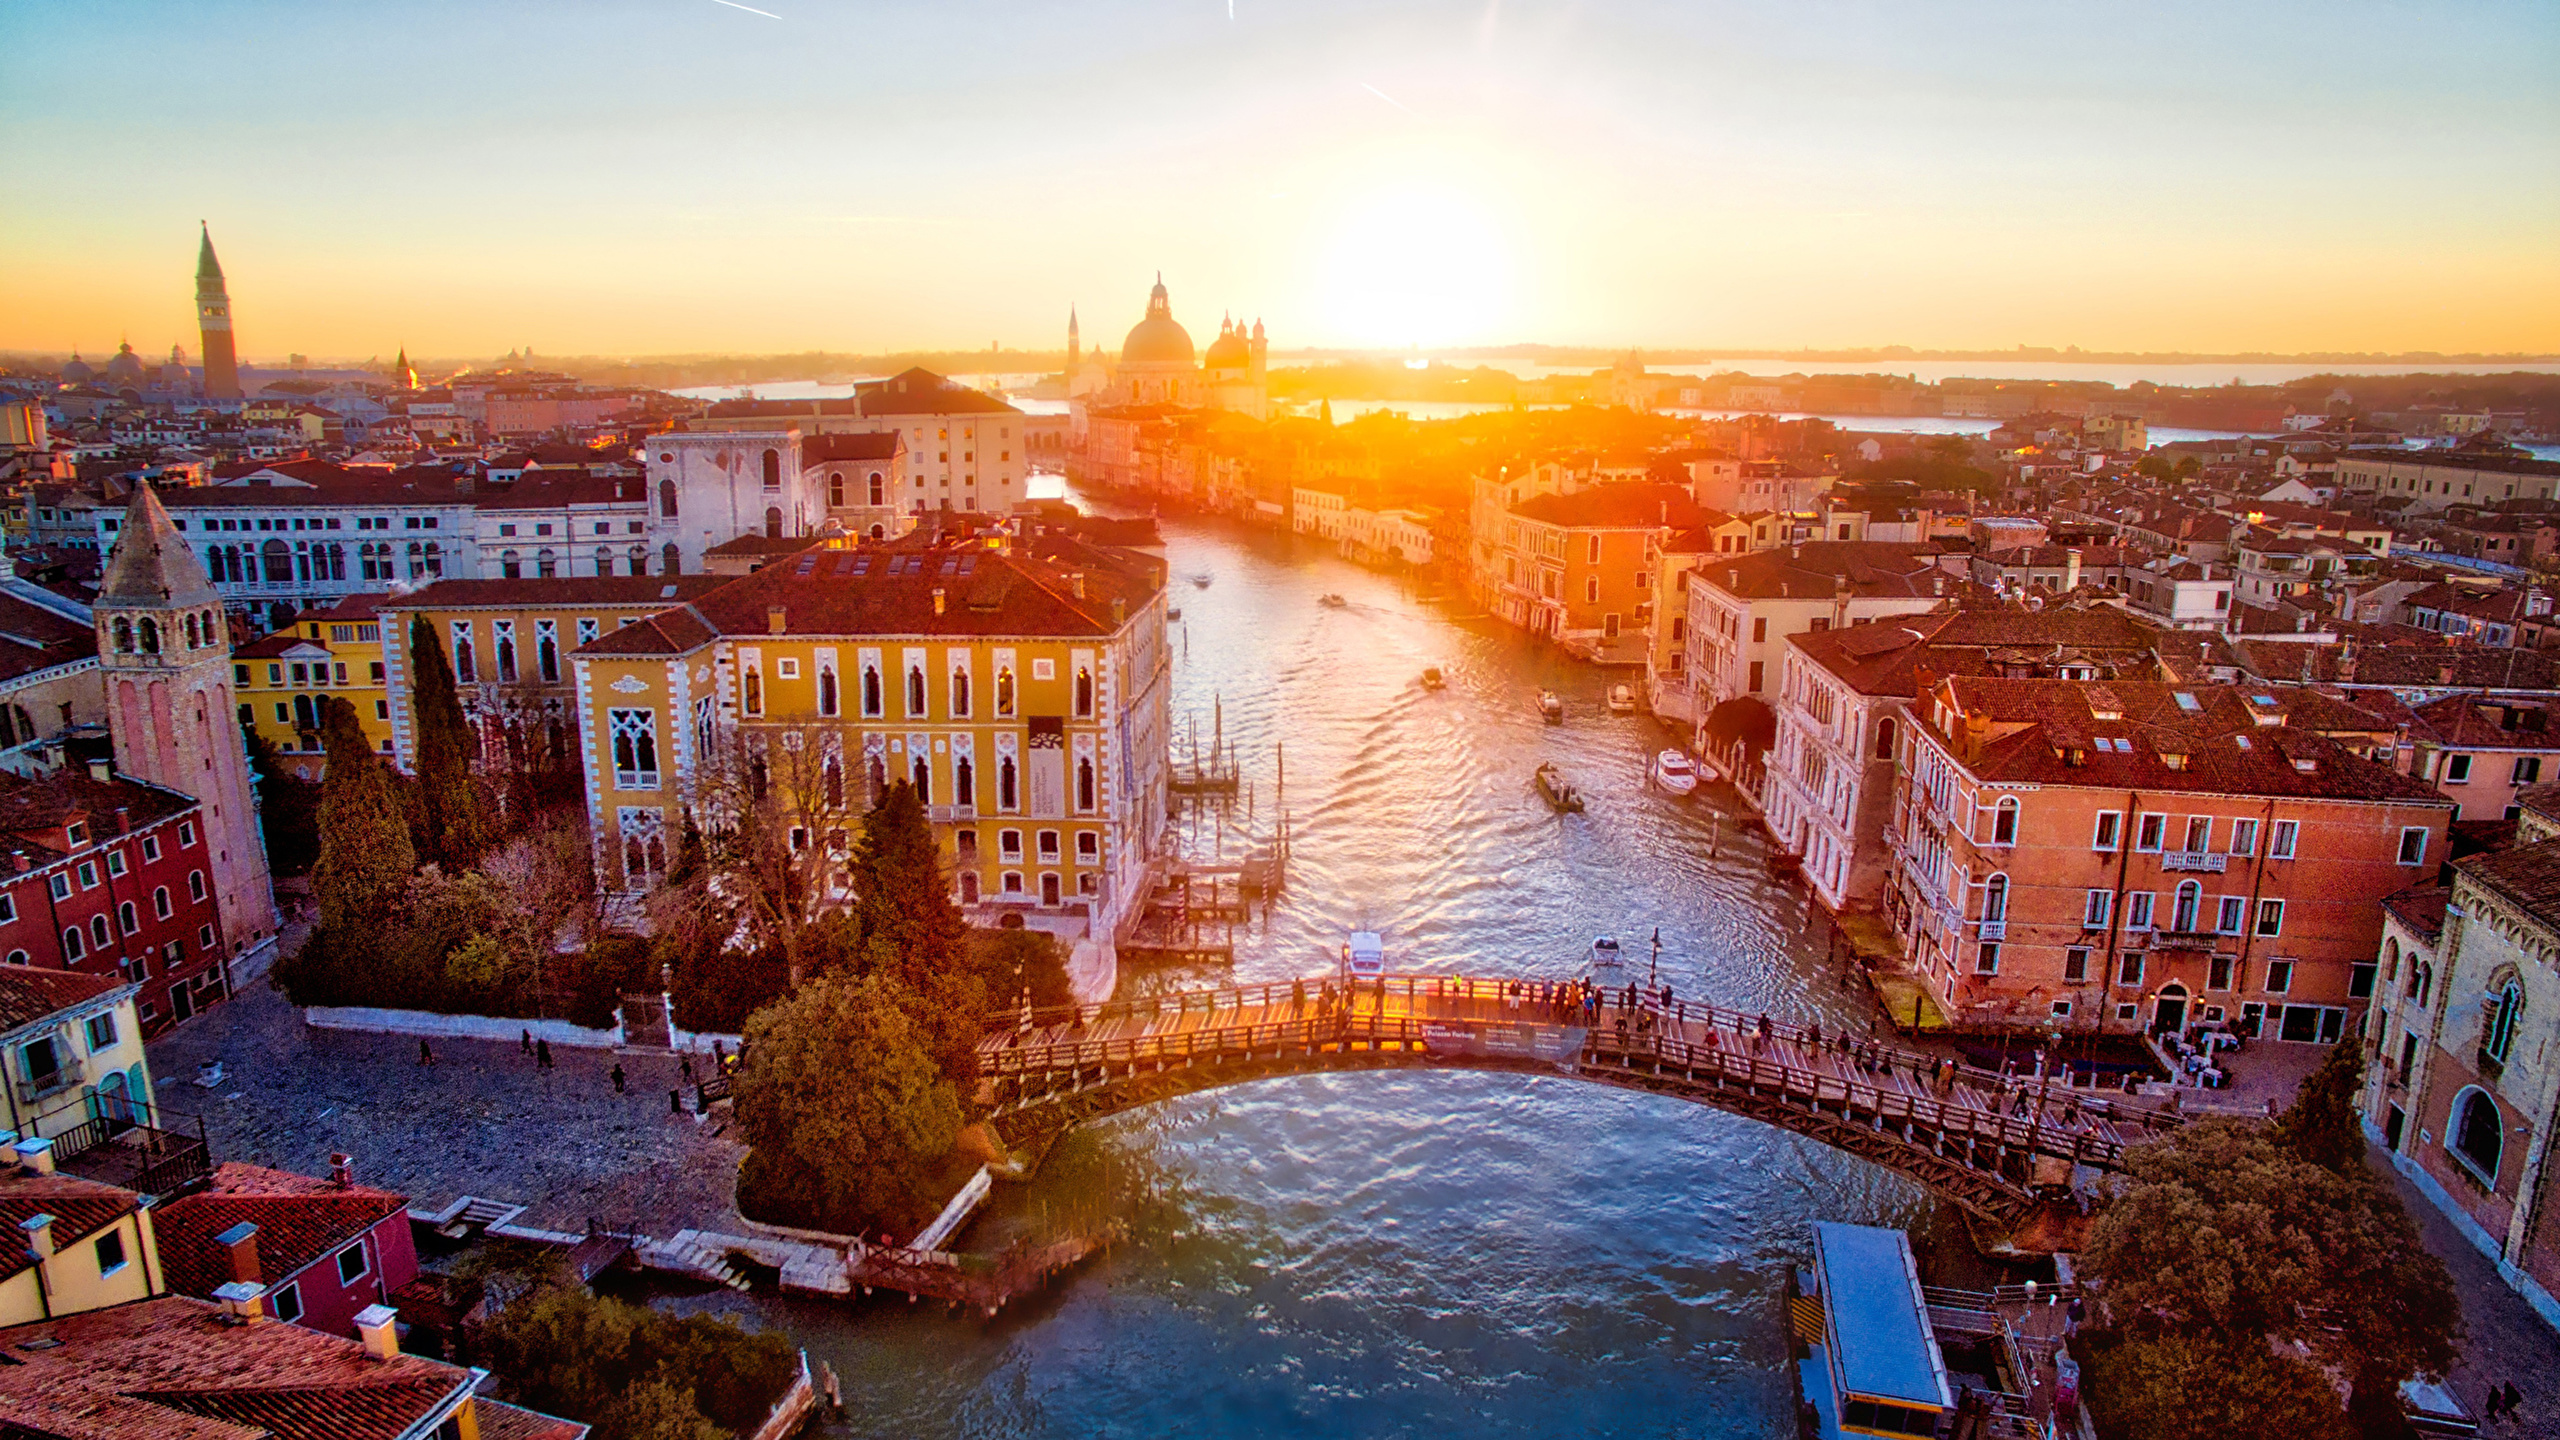 Wallpaper Venice Italy Bridge Sunrise And Sunset Rivers